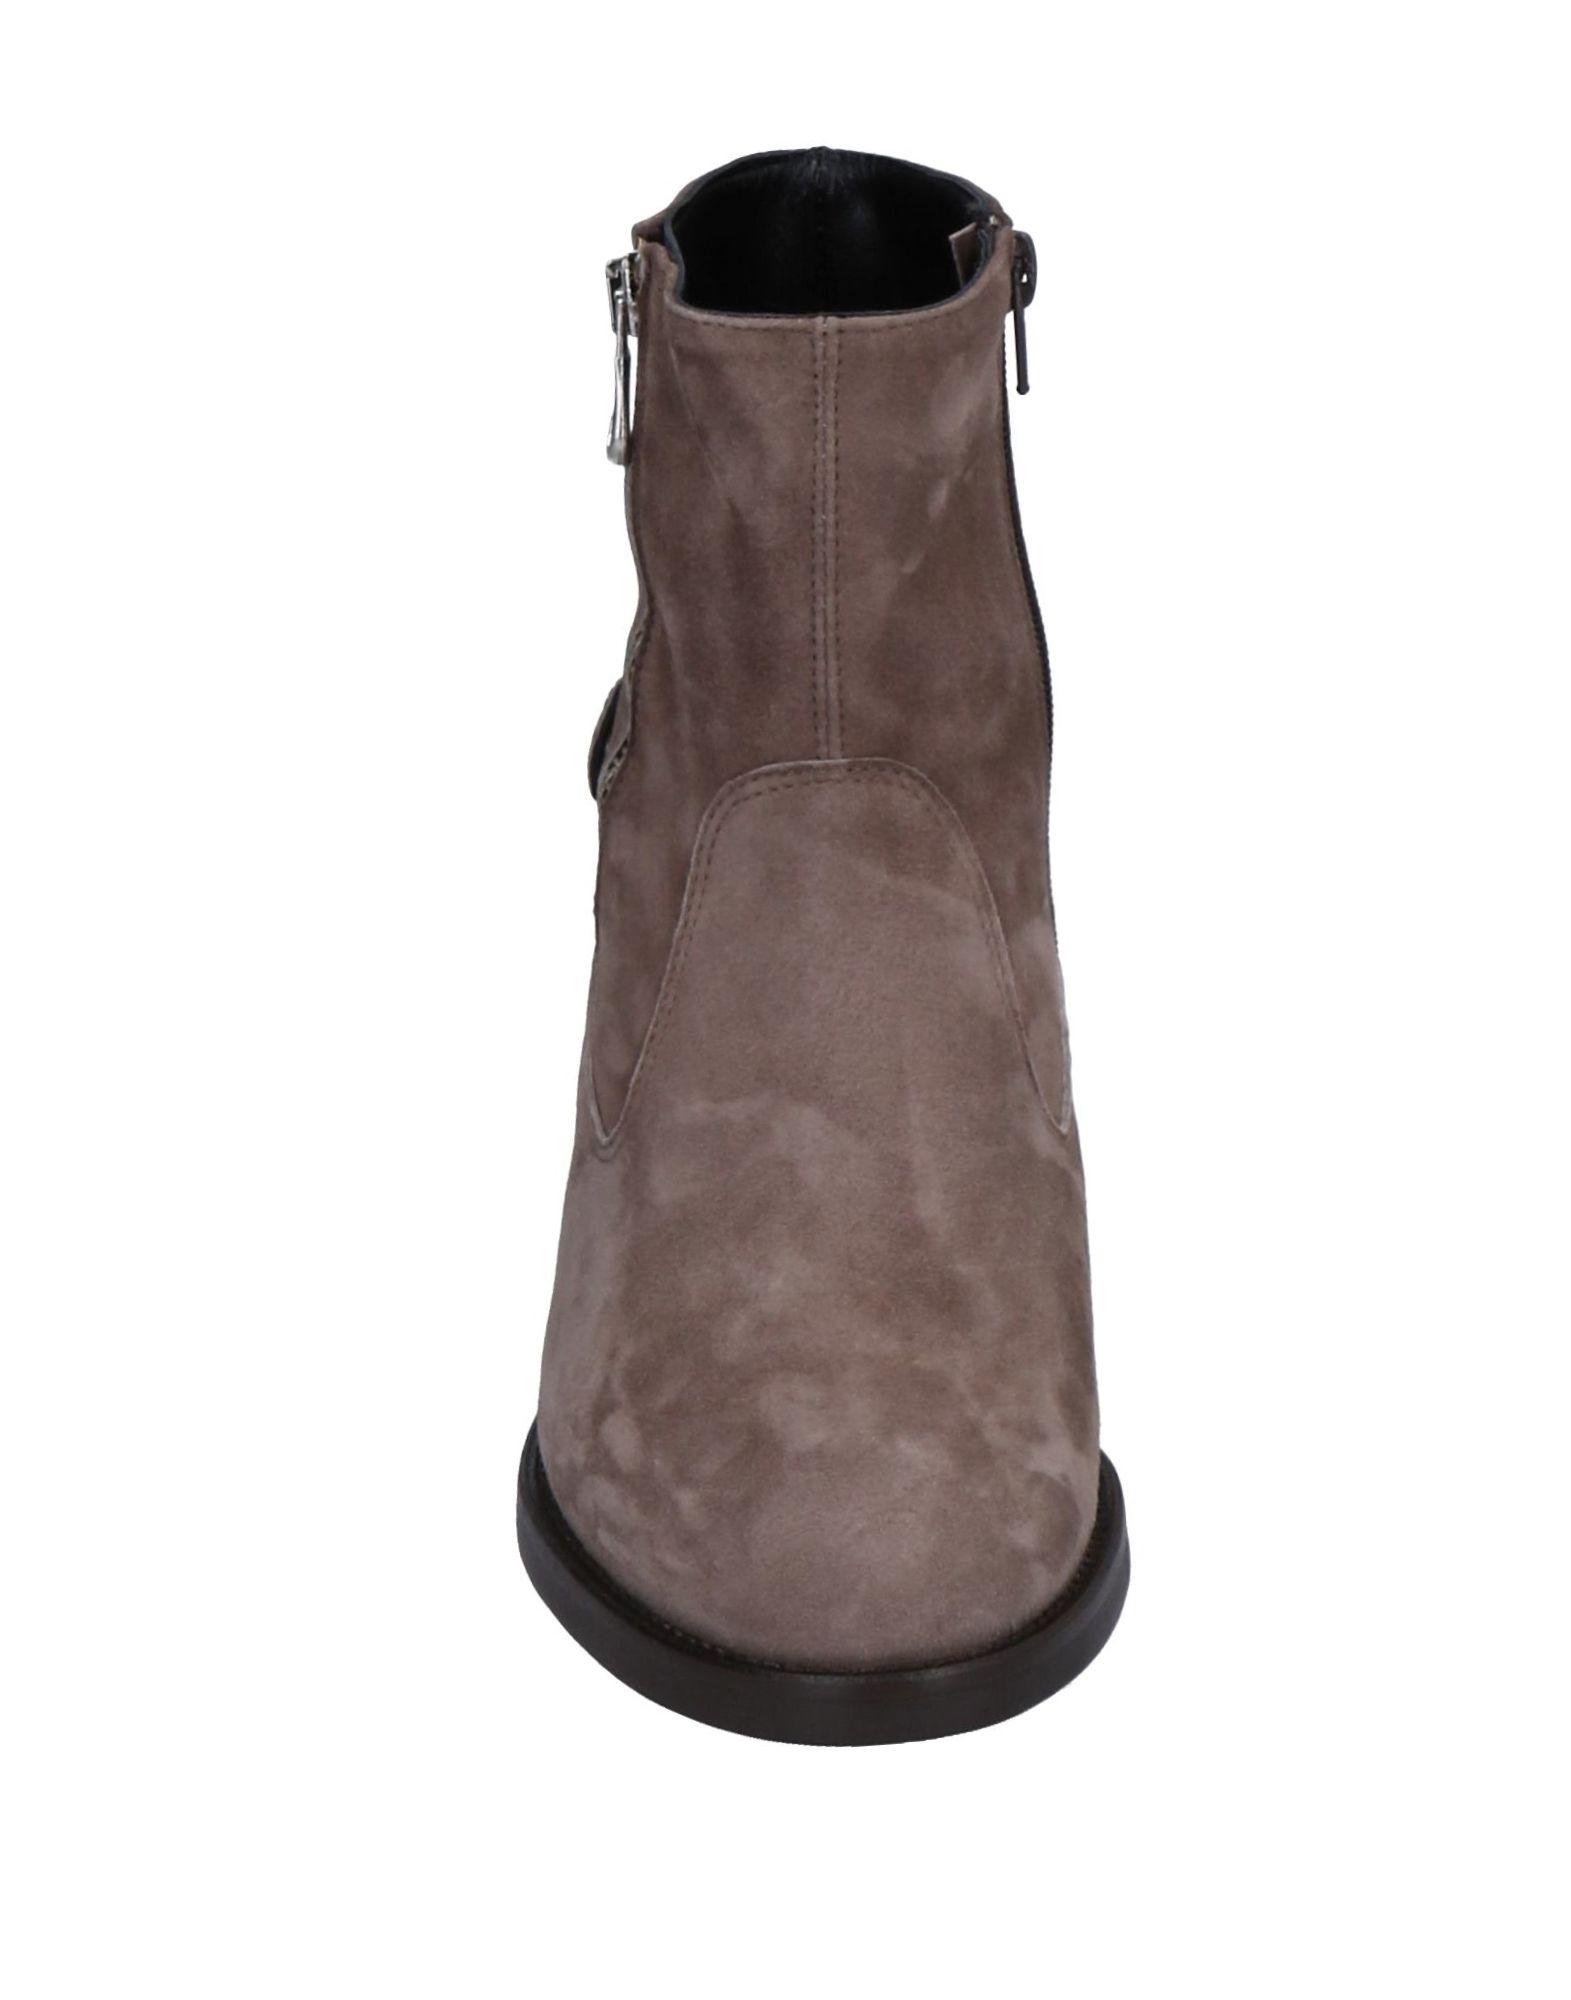 Merygen Gute Stiefelette Damen  11512941SB Gute Merygen Qualität beliebte Schuhe 785e9a